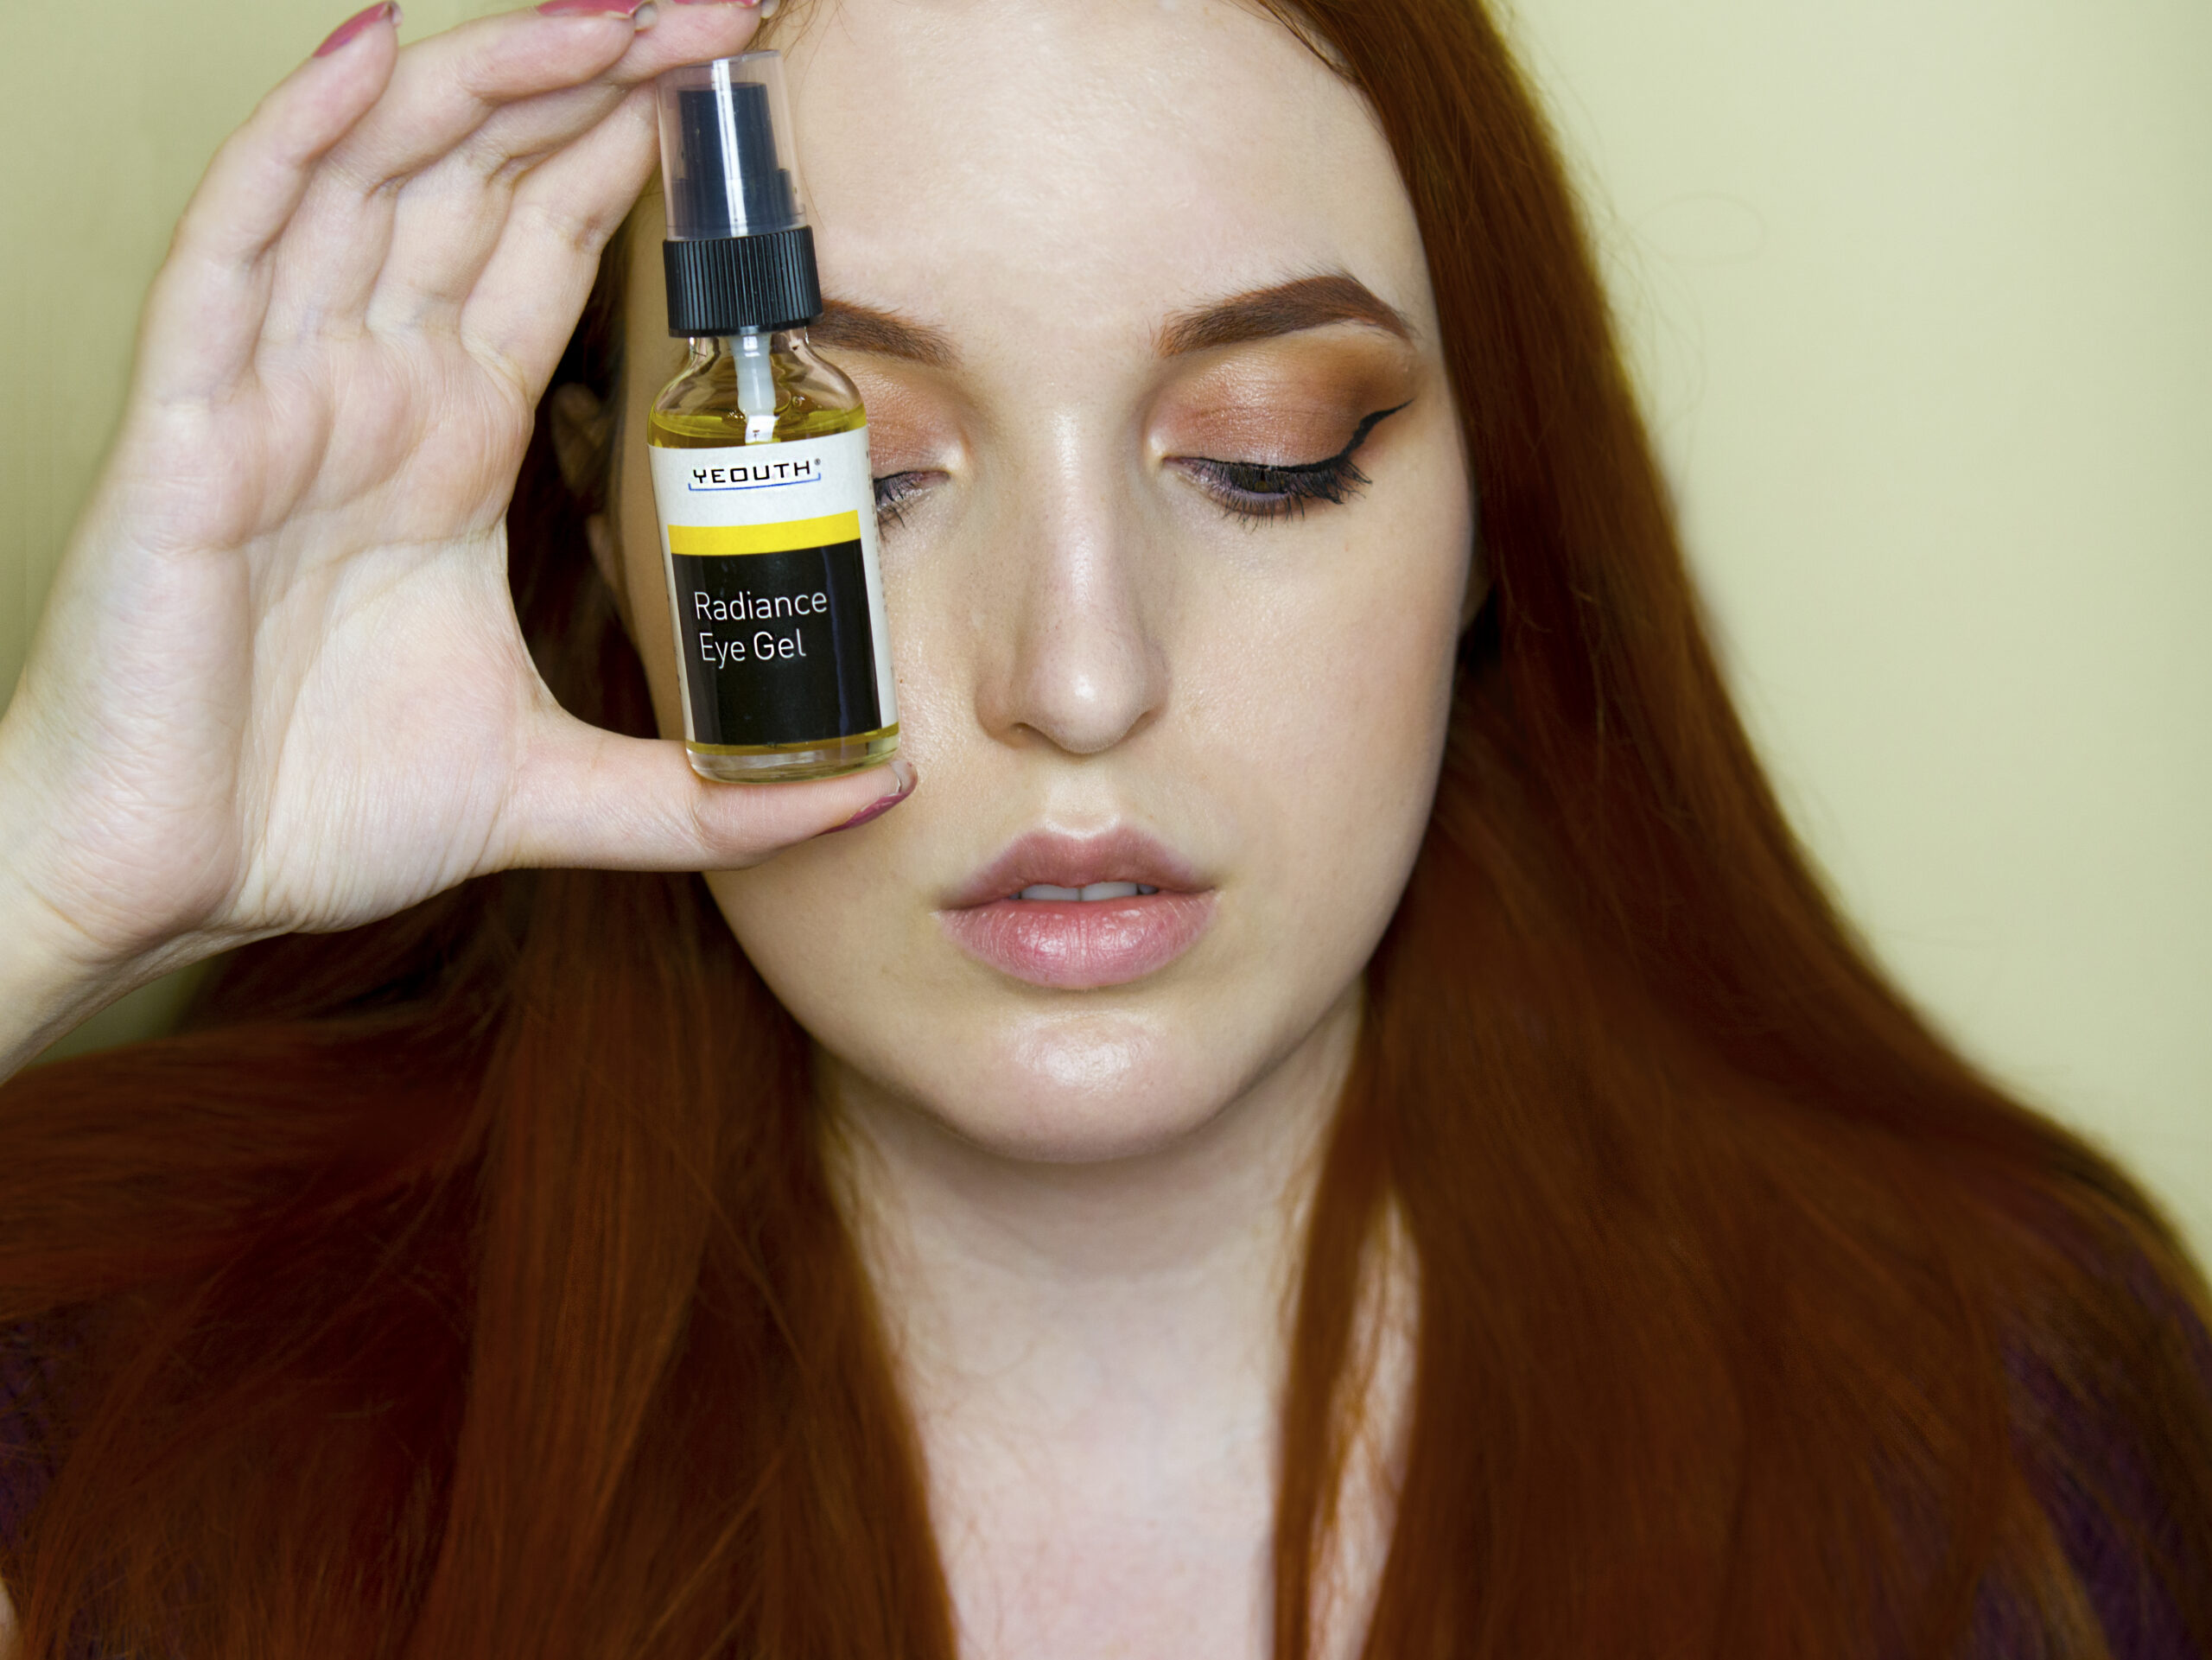 Yeouth radiance eye gel